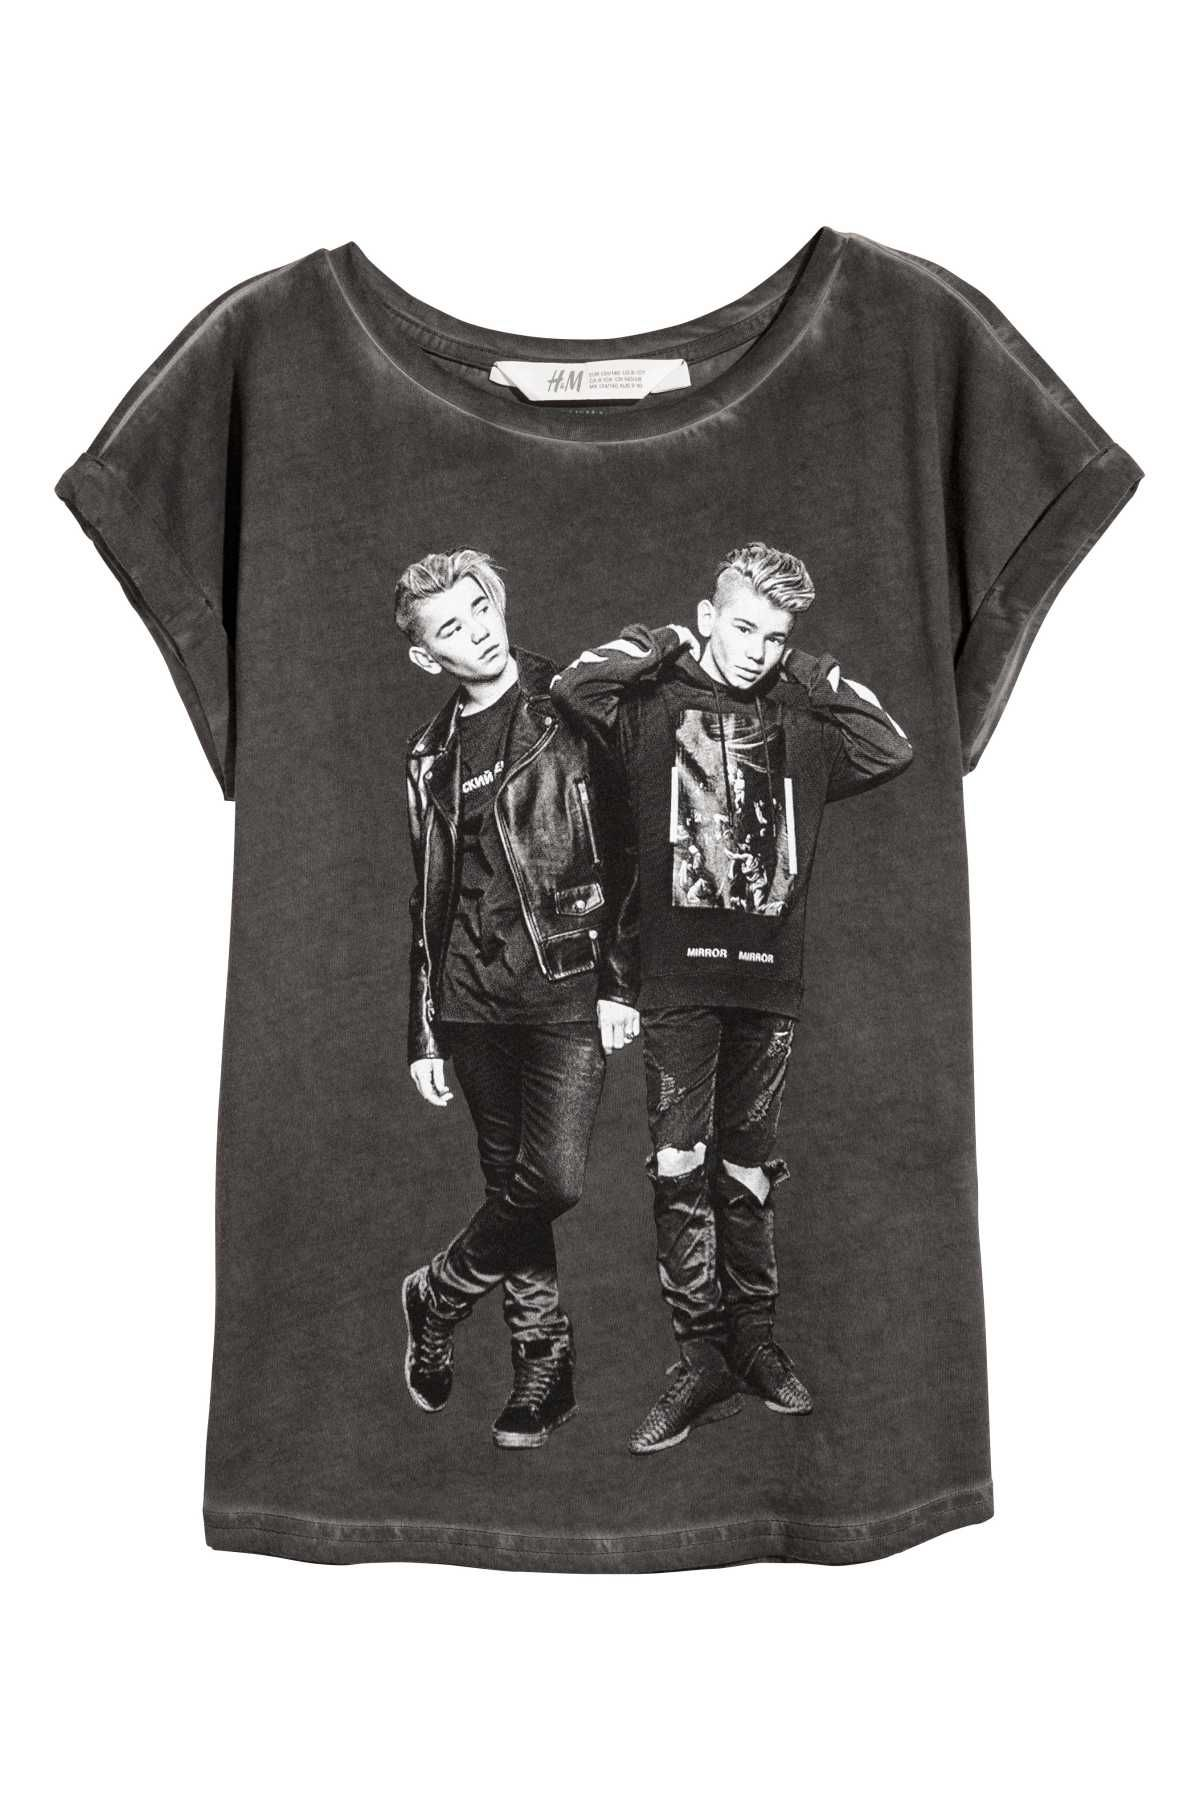 42428698ee8 Top with Printed Design | Black/Marcus & Martinus | KIDS | H&M US ...